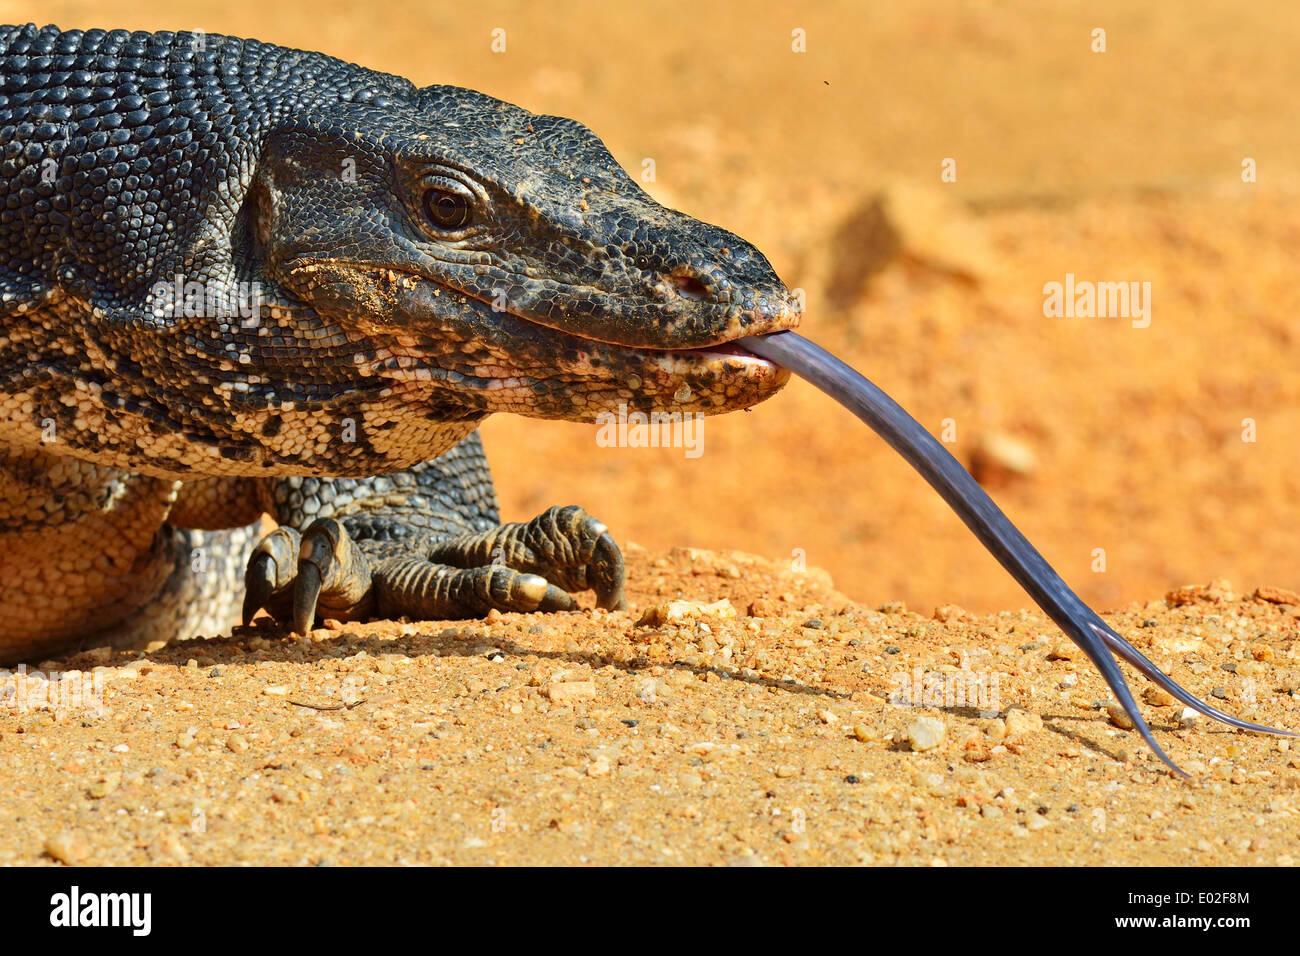 Control de agua (Varanus salvator salvator), Polonnaruwa, la Provincia Central del Norte, Sri Lanka Imagen De Stock